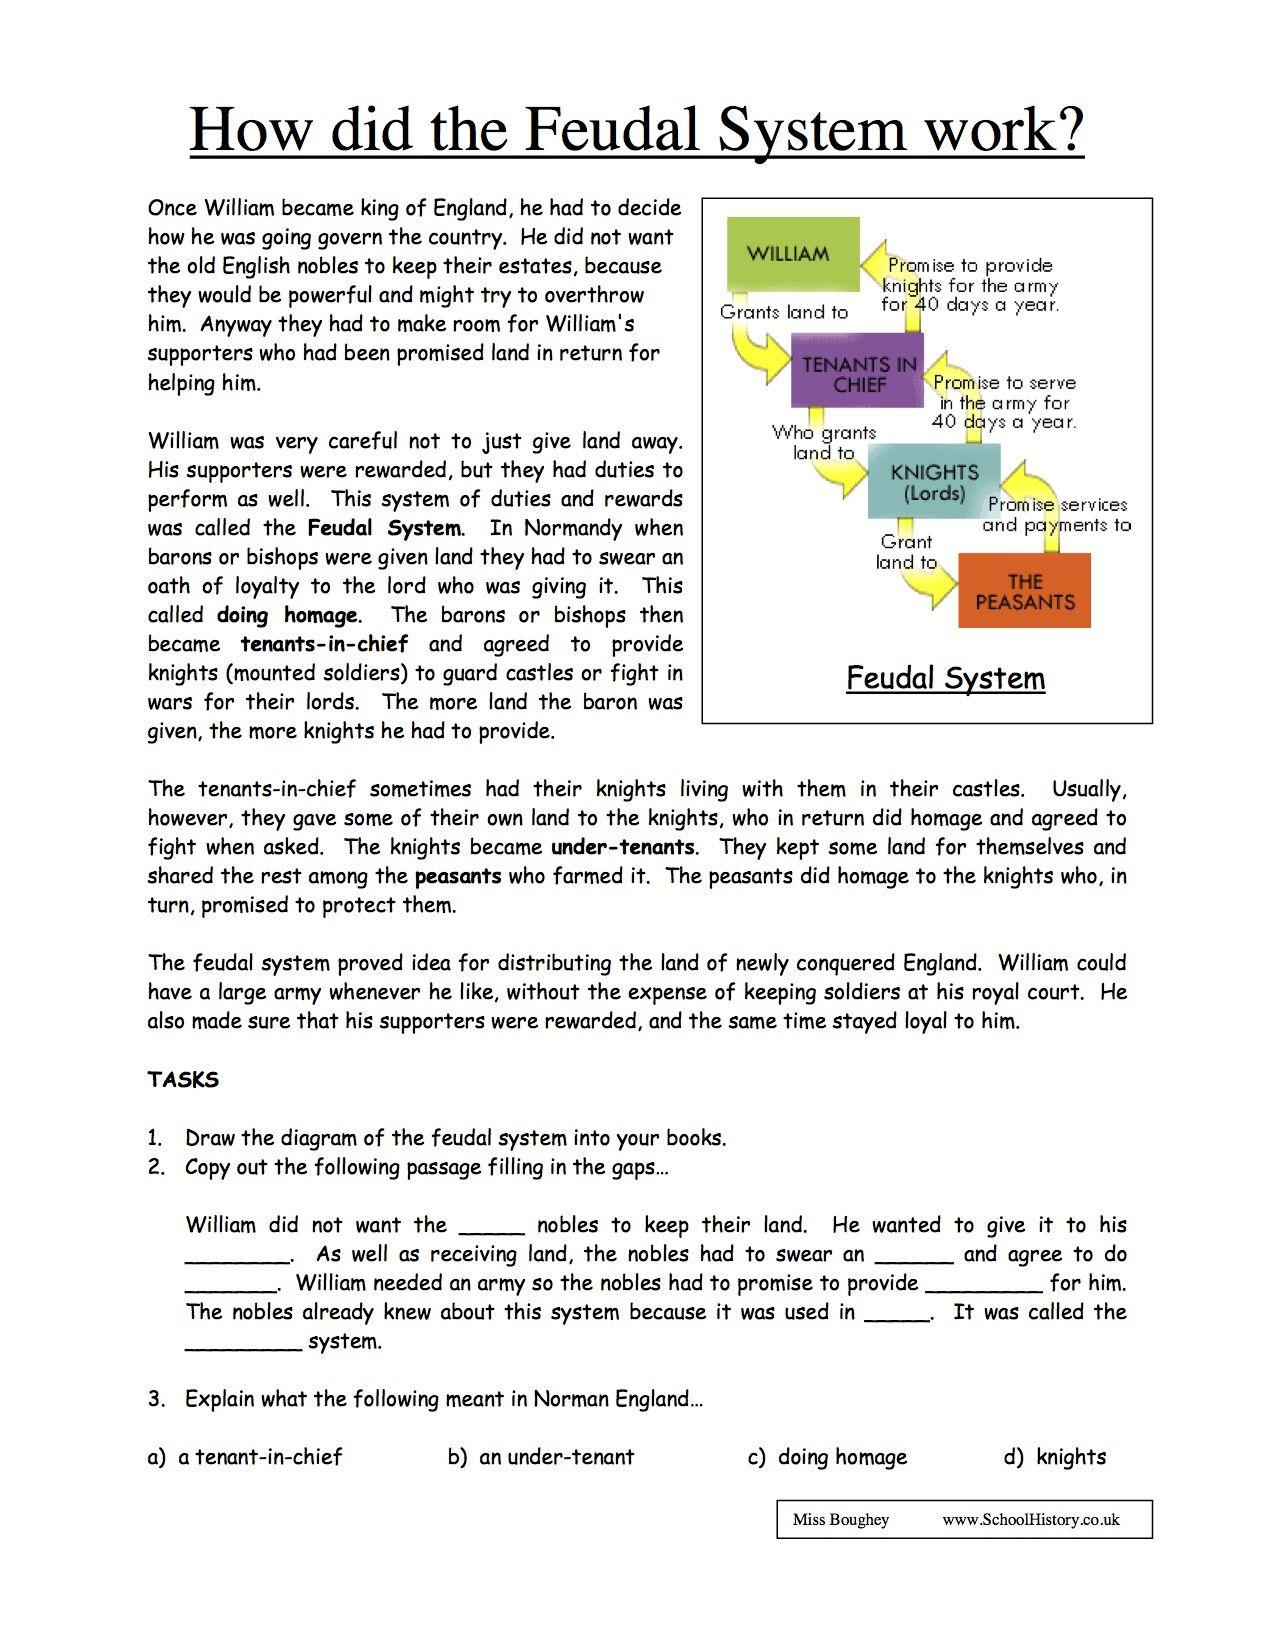 Free History Worksheets | Ks3 & Ks4 Lesson Plans & Resources | Literacy Worksheets Ks3 Printable